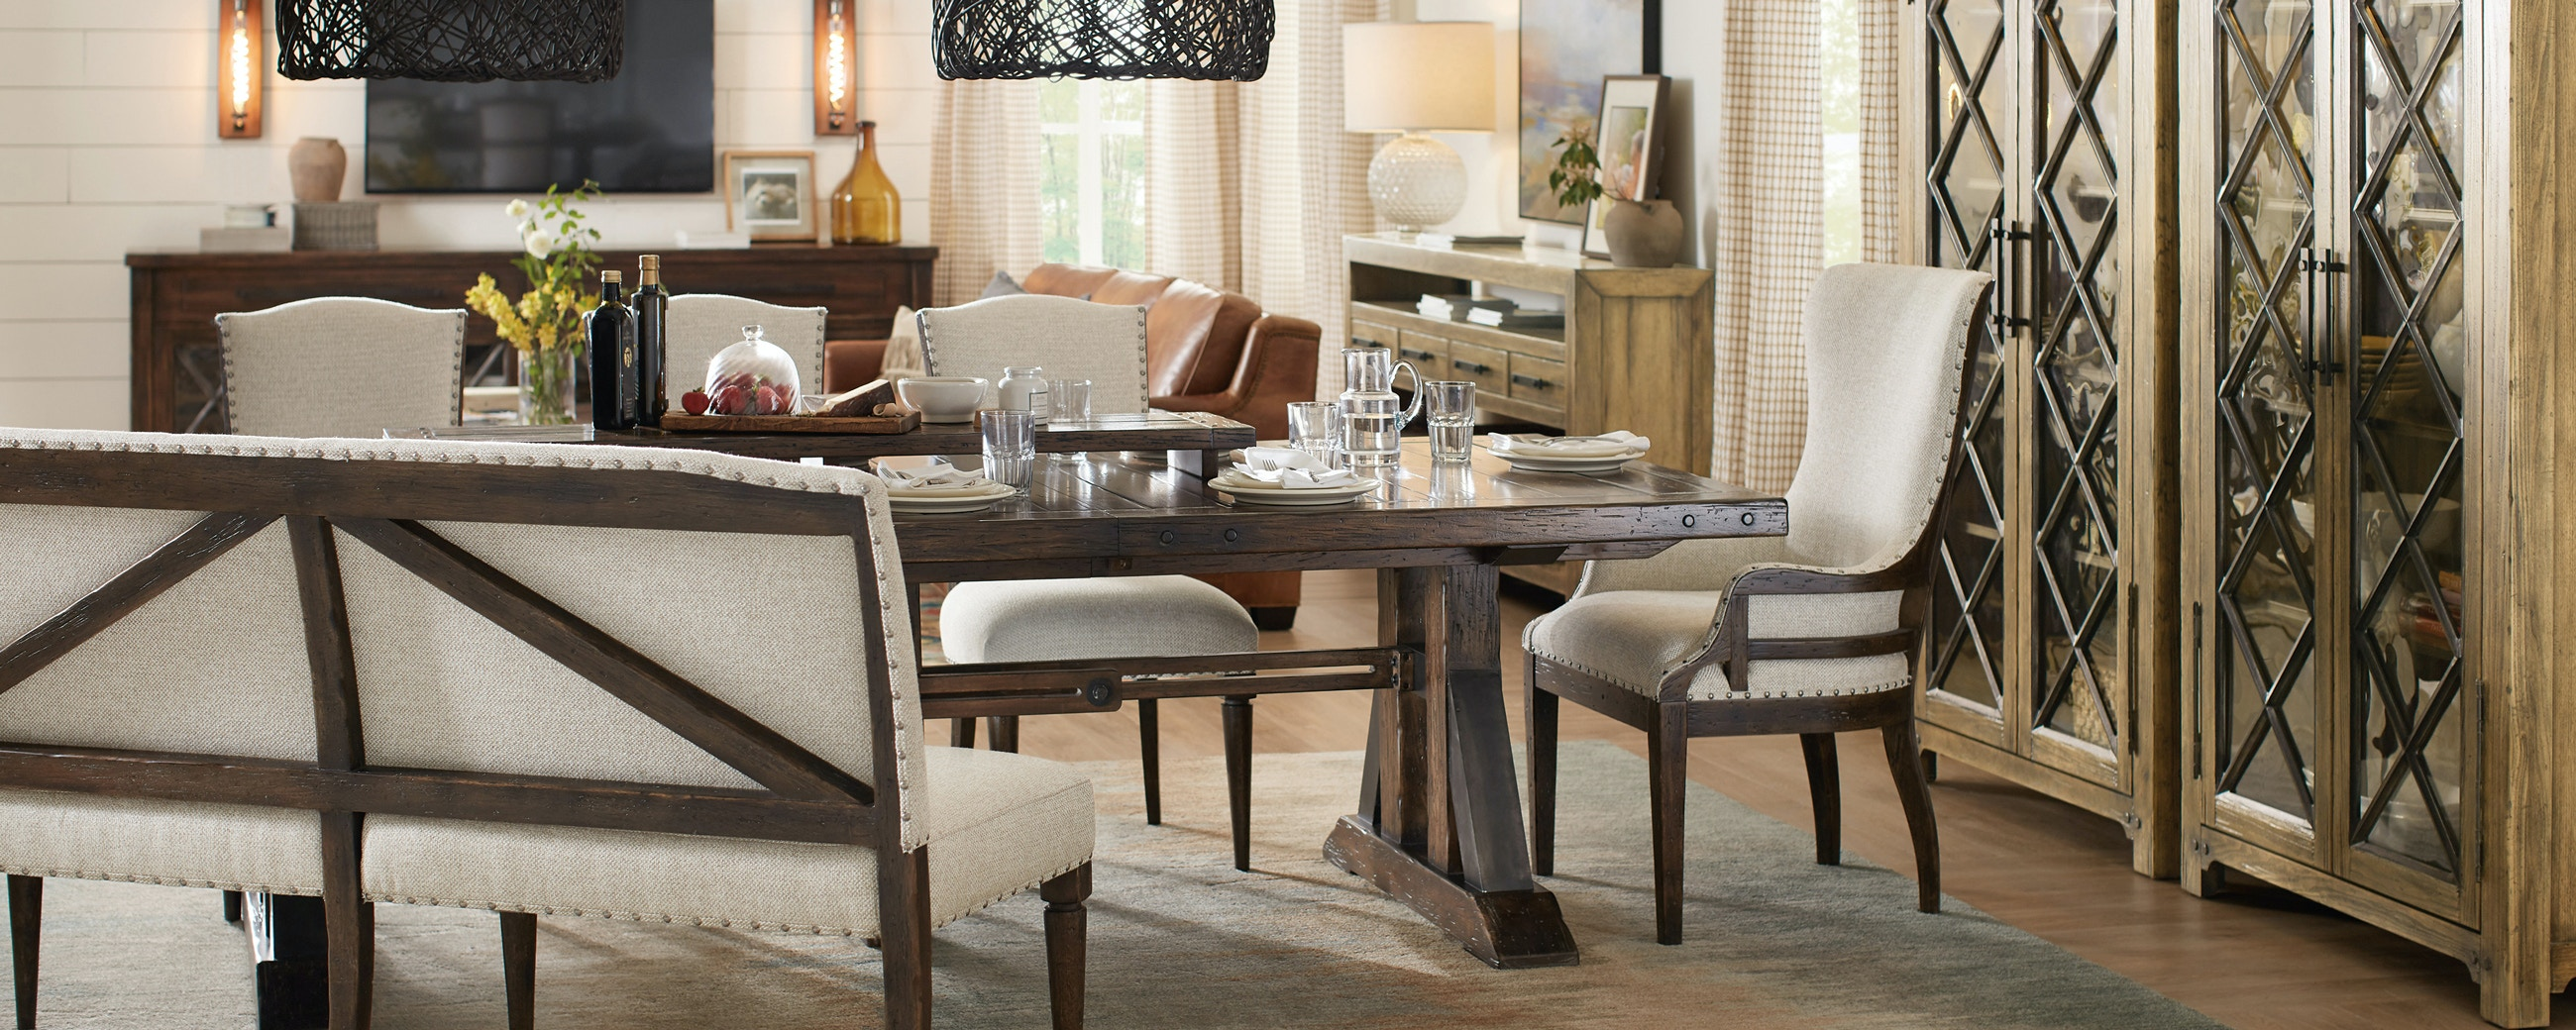 Living Room Furniture Design. Roslyn County Living Room Furniture Design